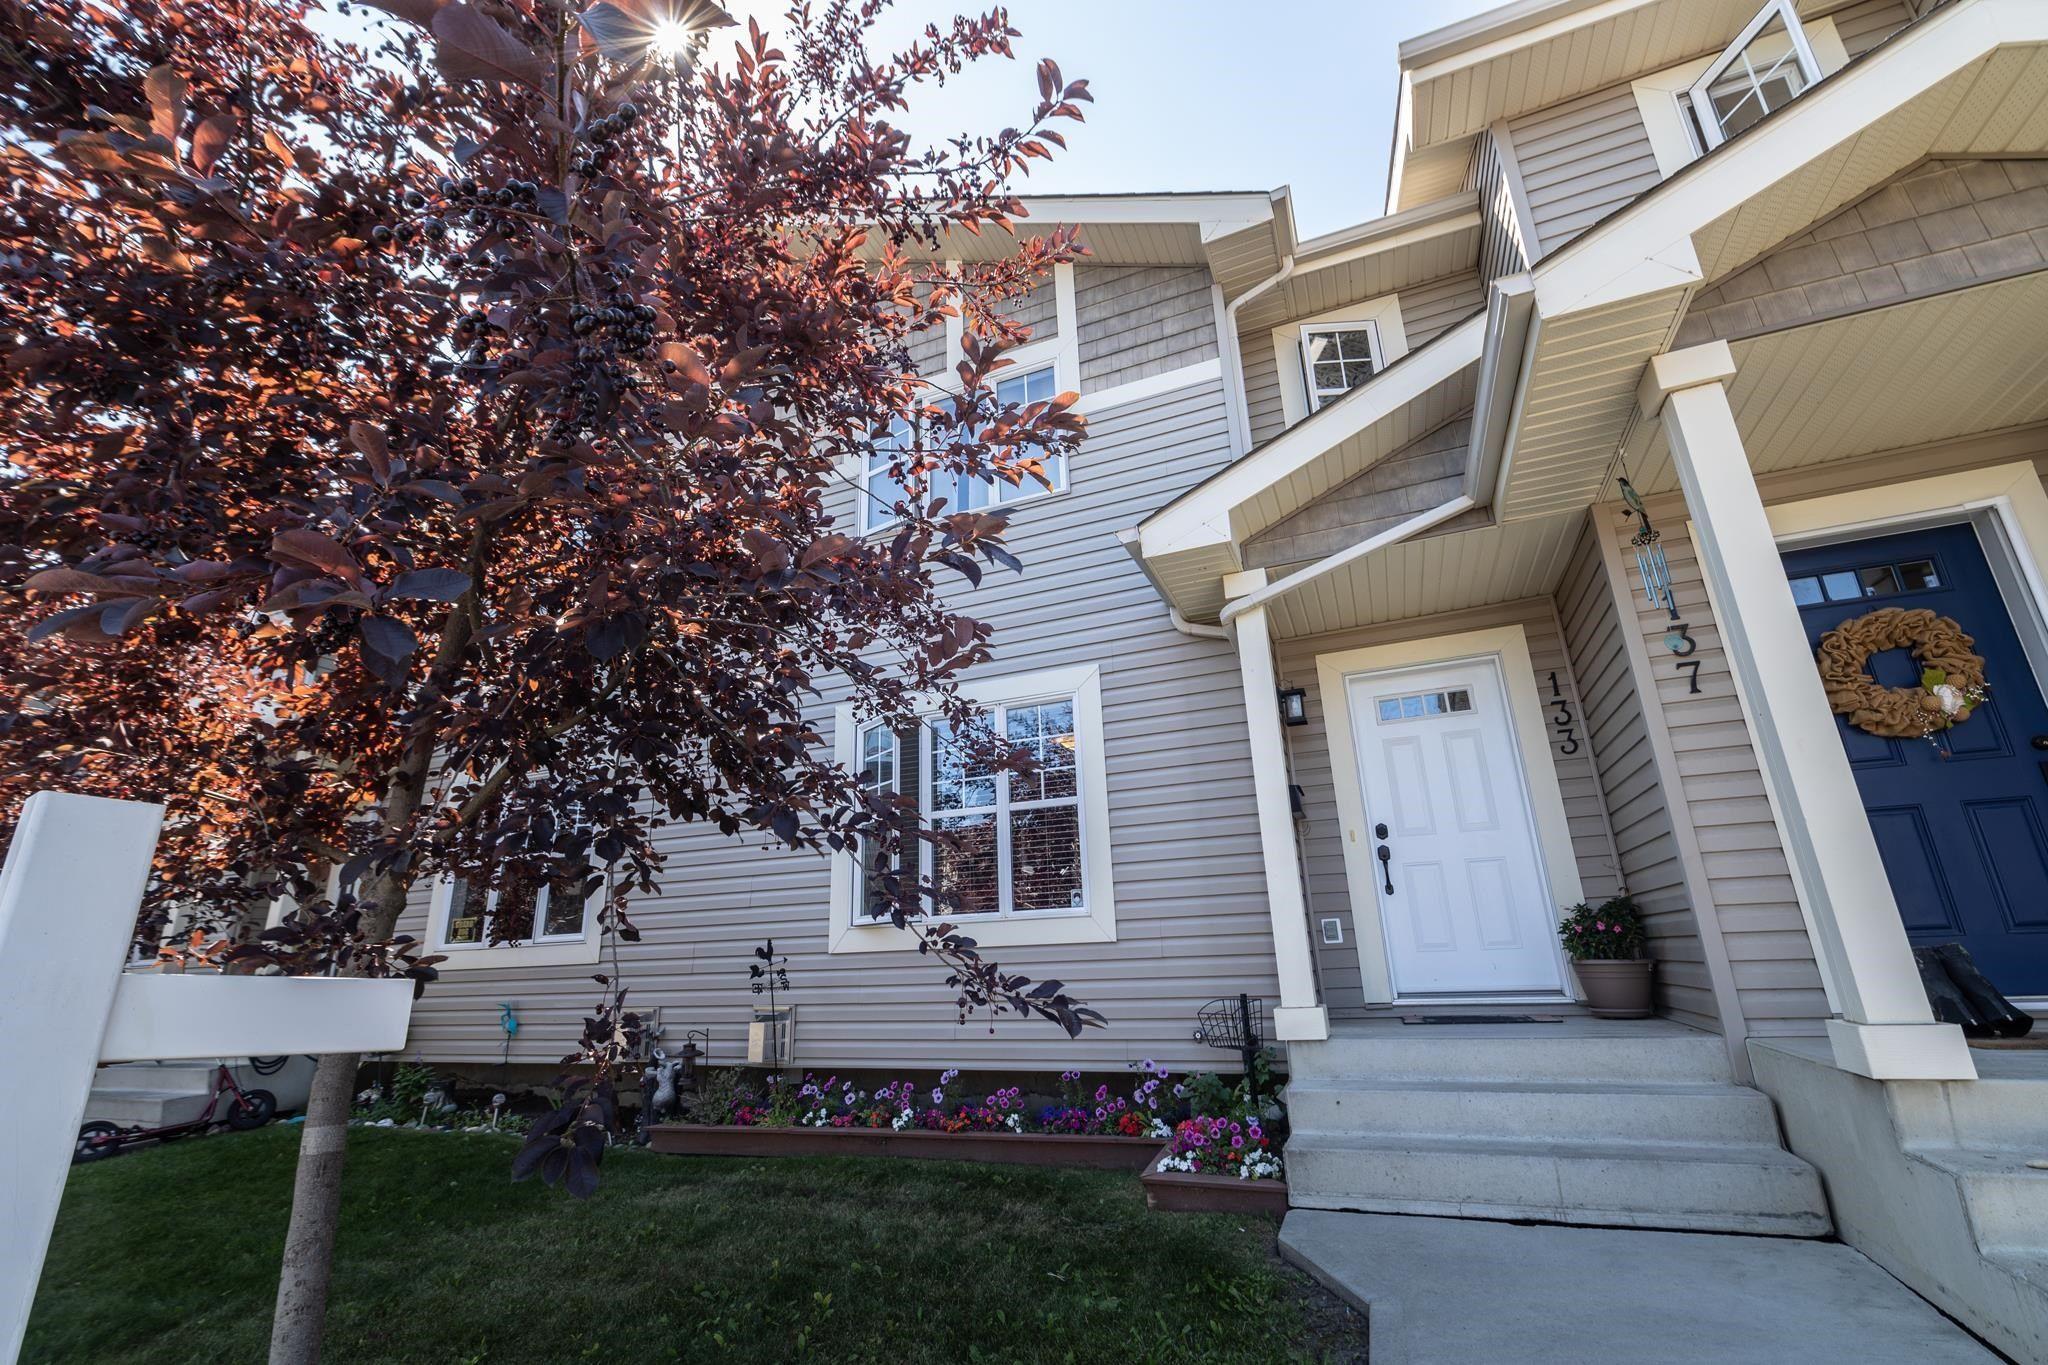 Main Photo: 133 BIRCHWOOD Close: Devon Townhouse for sale : MLS®# E4258828